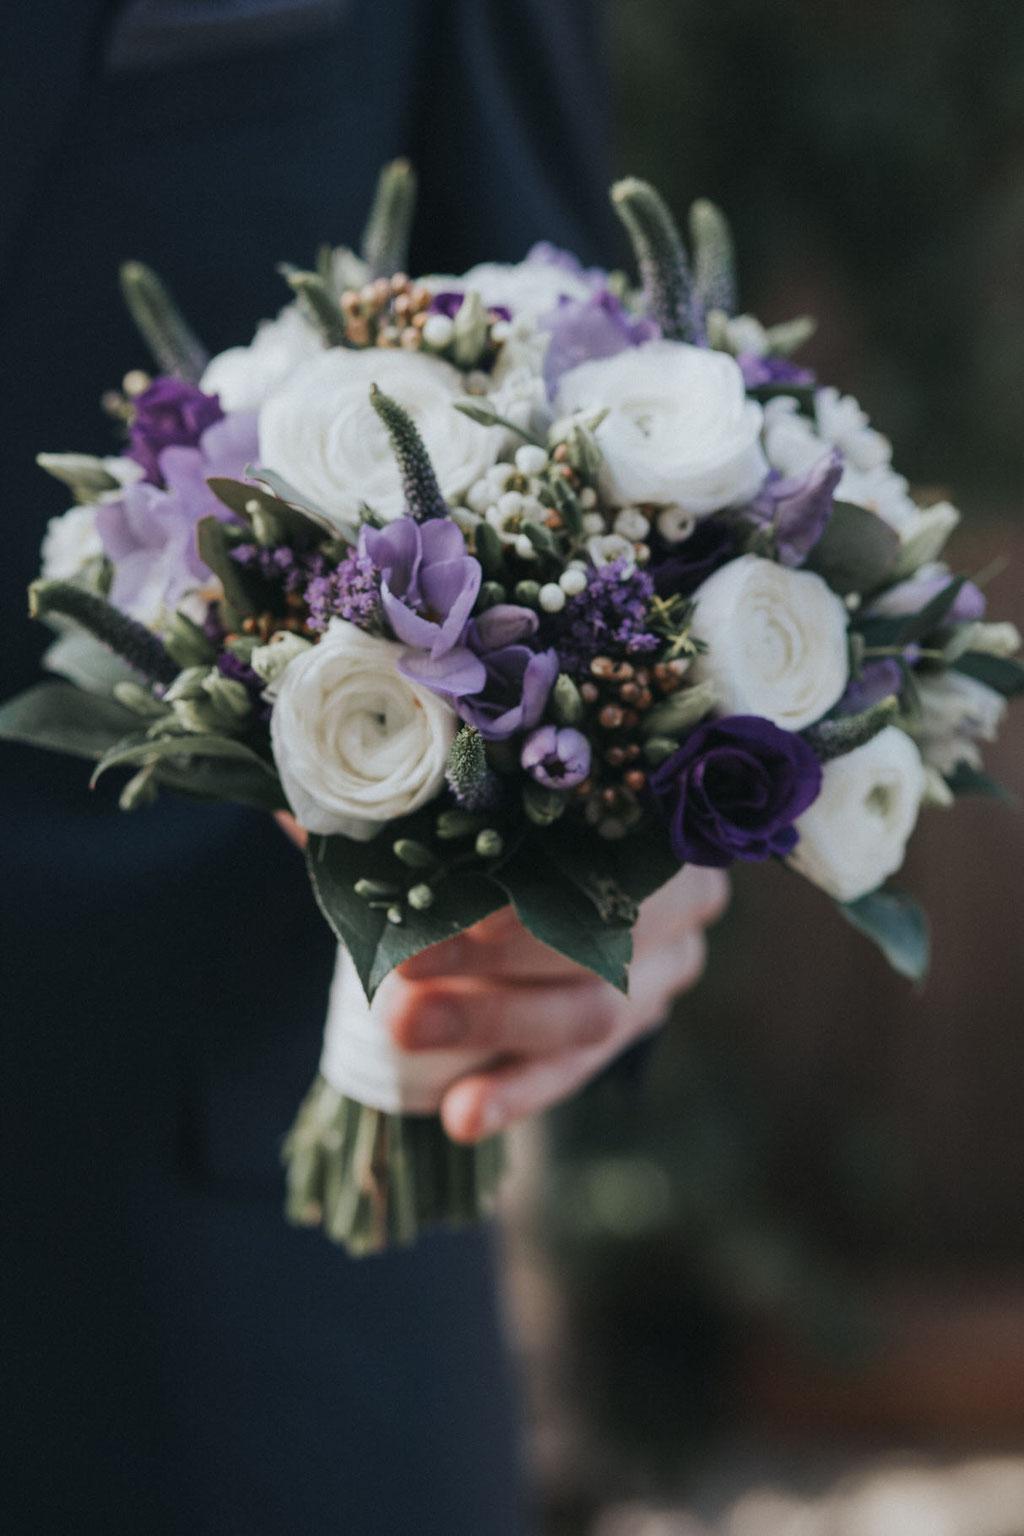 Brautstrauß mit lila Blumen